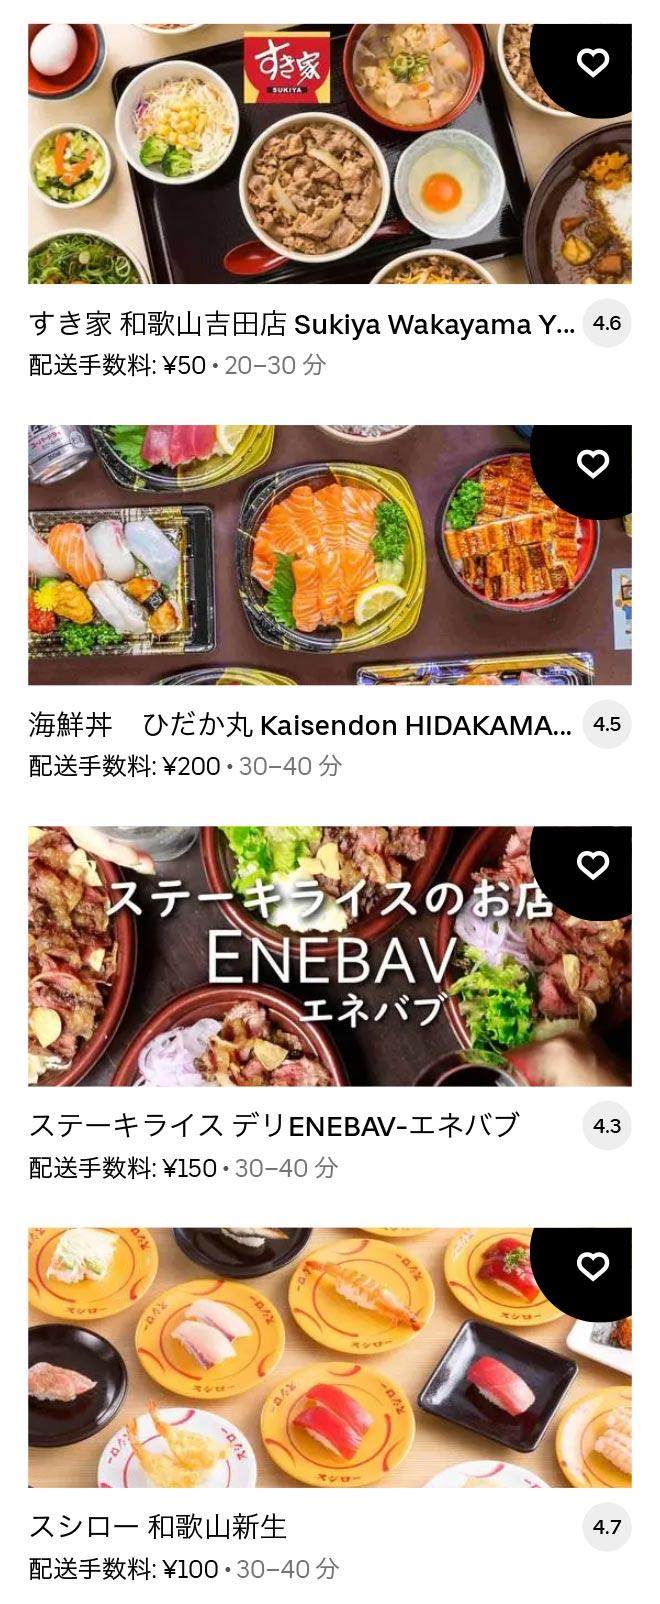 U wakayama menu 2104 06